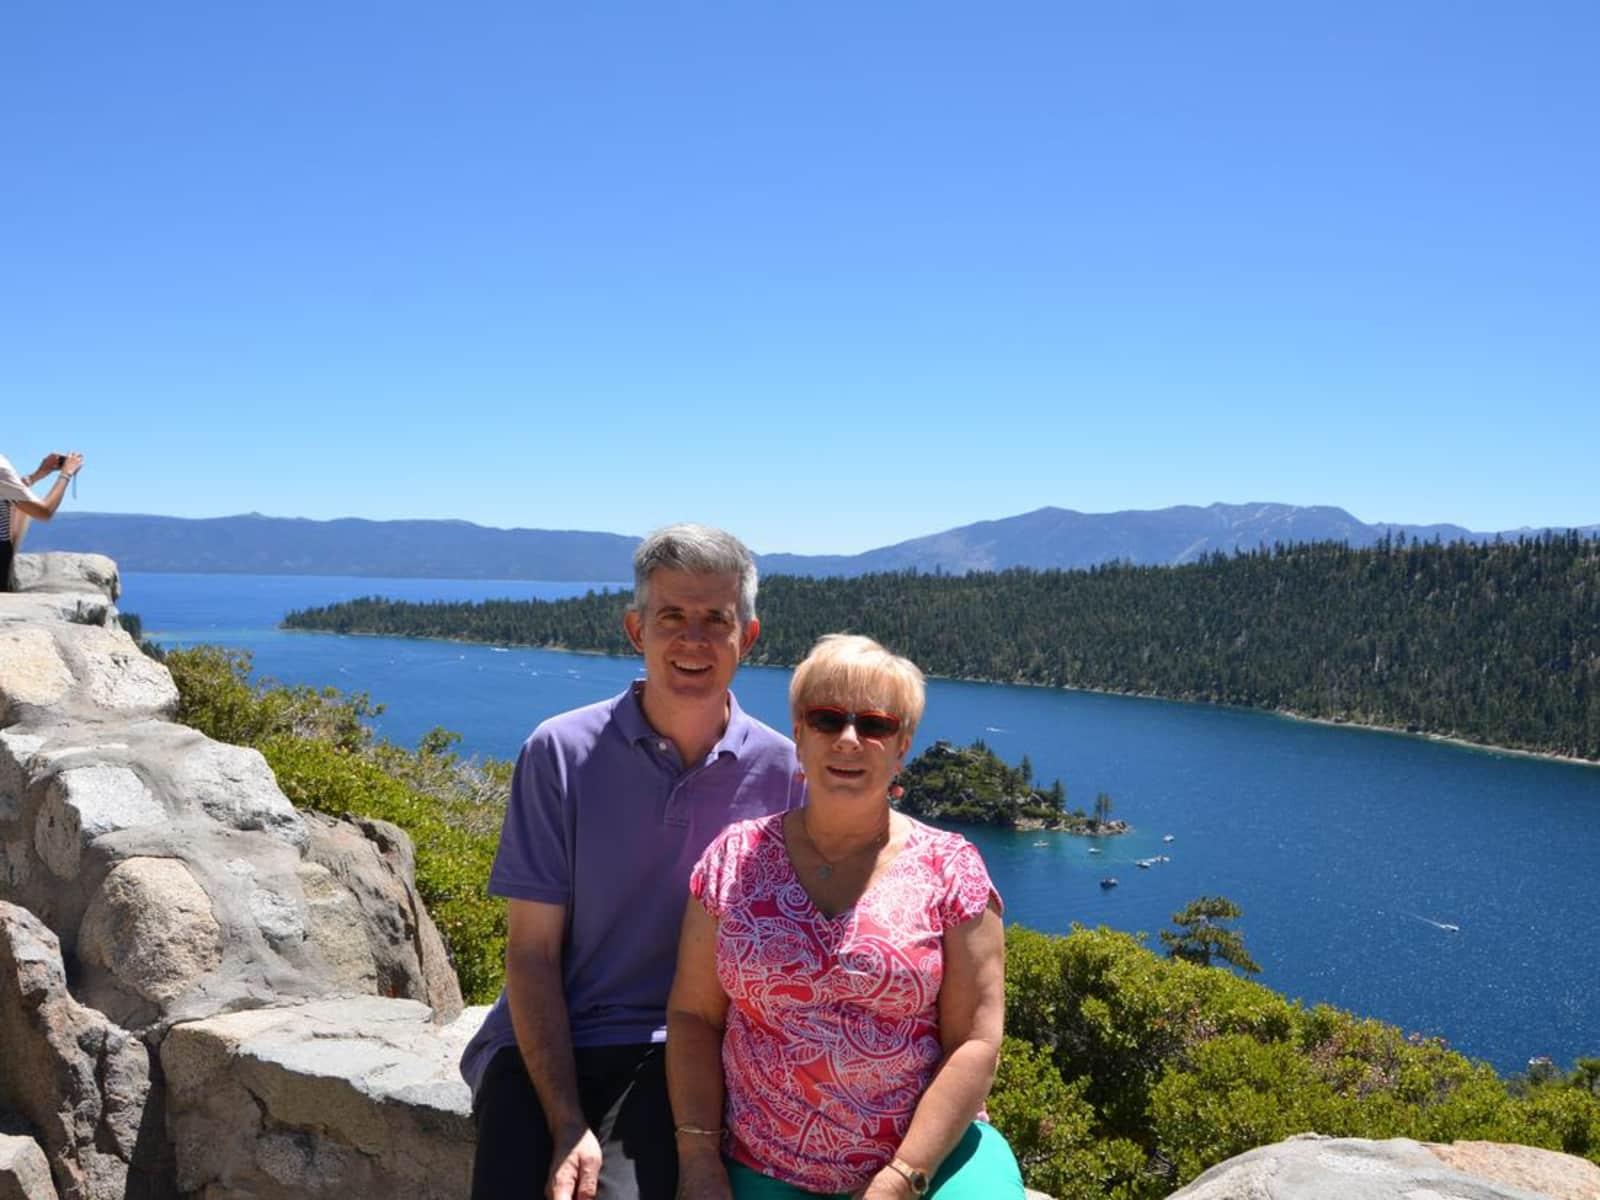 Debra & Craig from Kiama, New South Wales, Australia